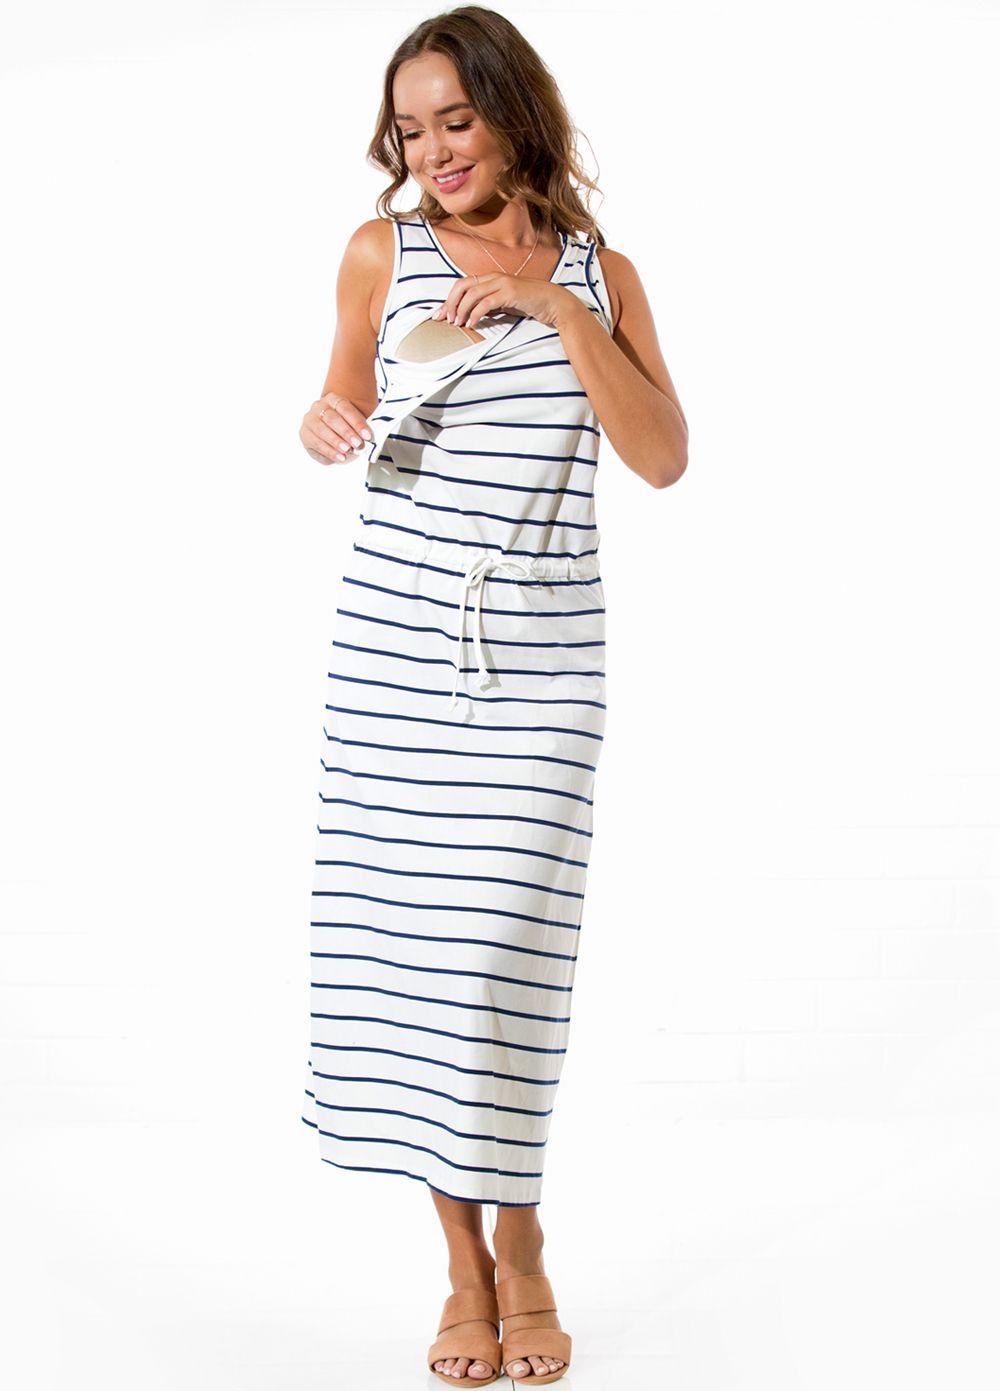 Trimester Delta Breastfeeding Maxi Dress Breastfeeding Fashion Outfits Breastfeeding Dress Feeding Dresses